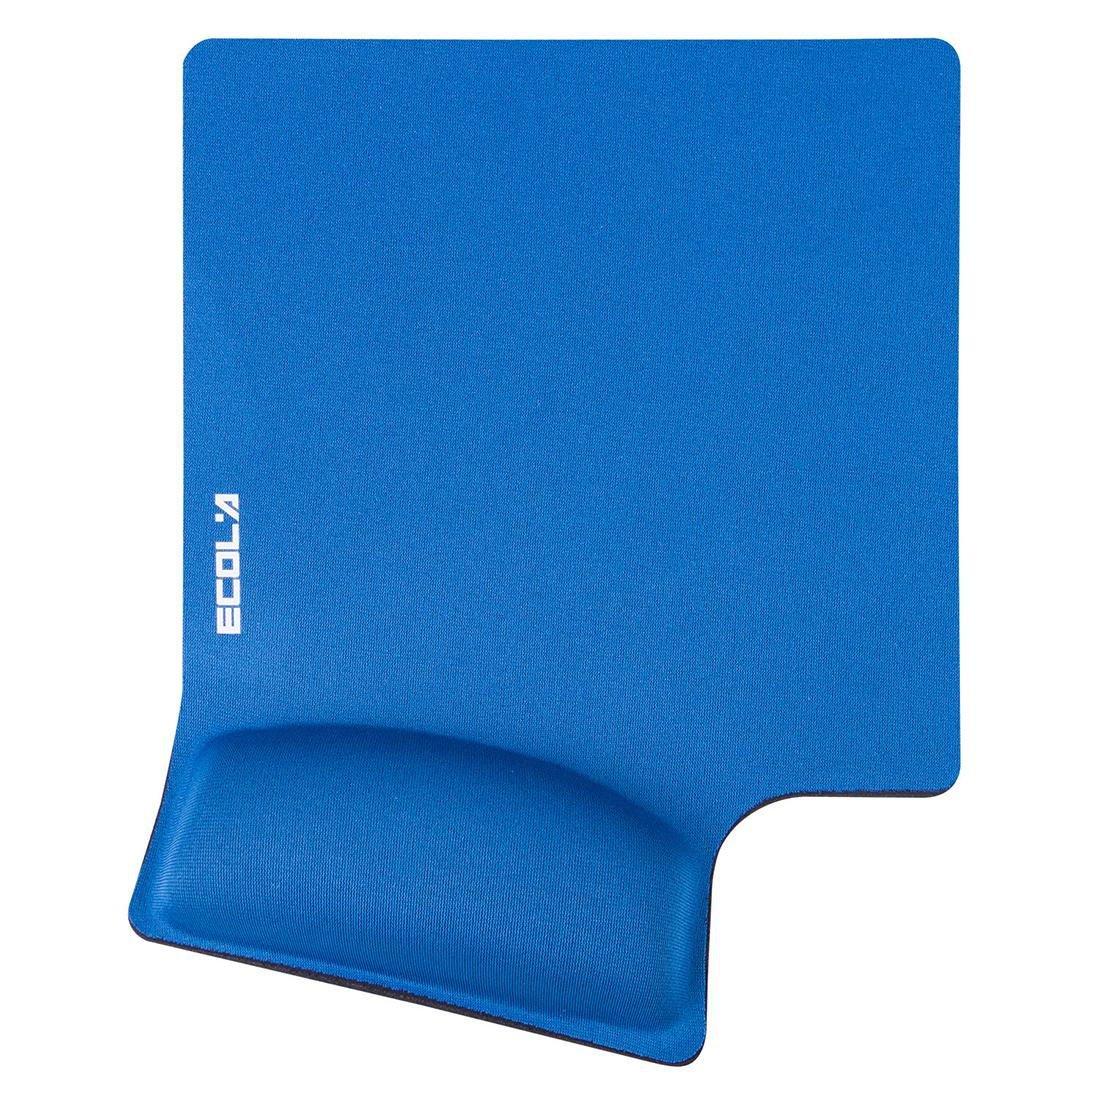 ECOLA MPD-014P Antifatigue Comfort 14°Ergonomic Waverest Mousepad